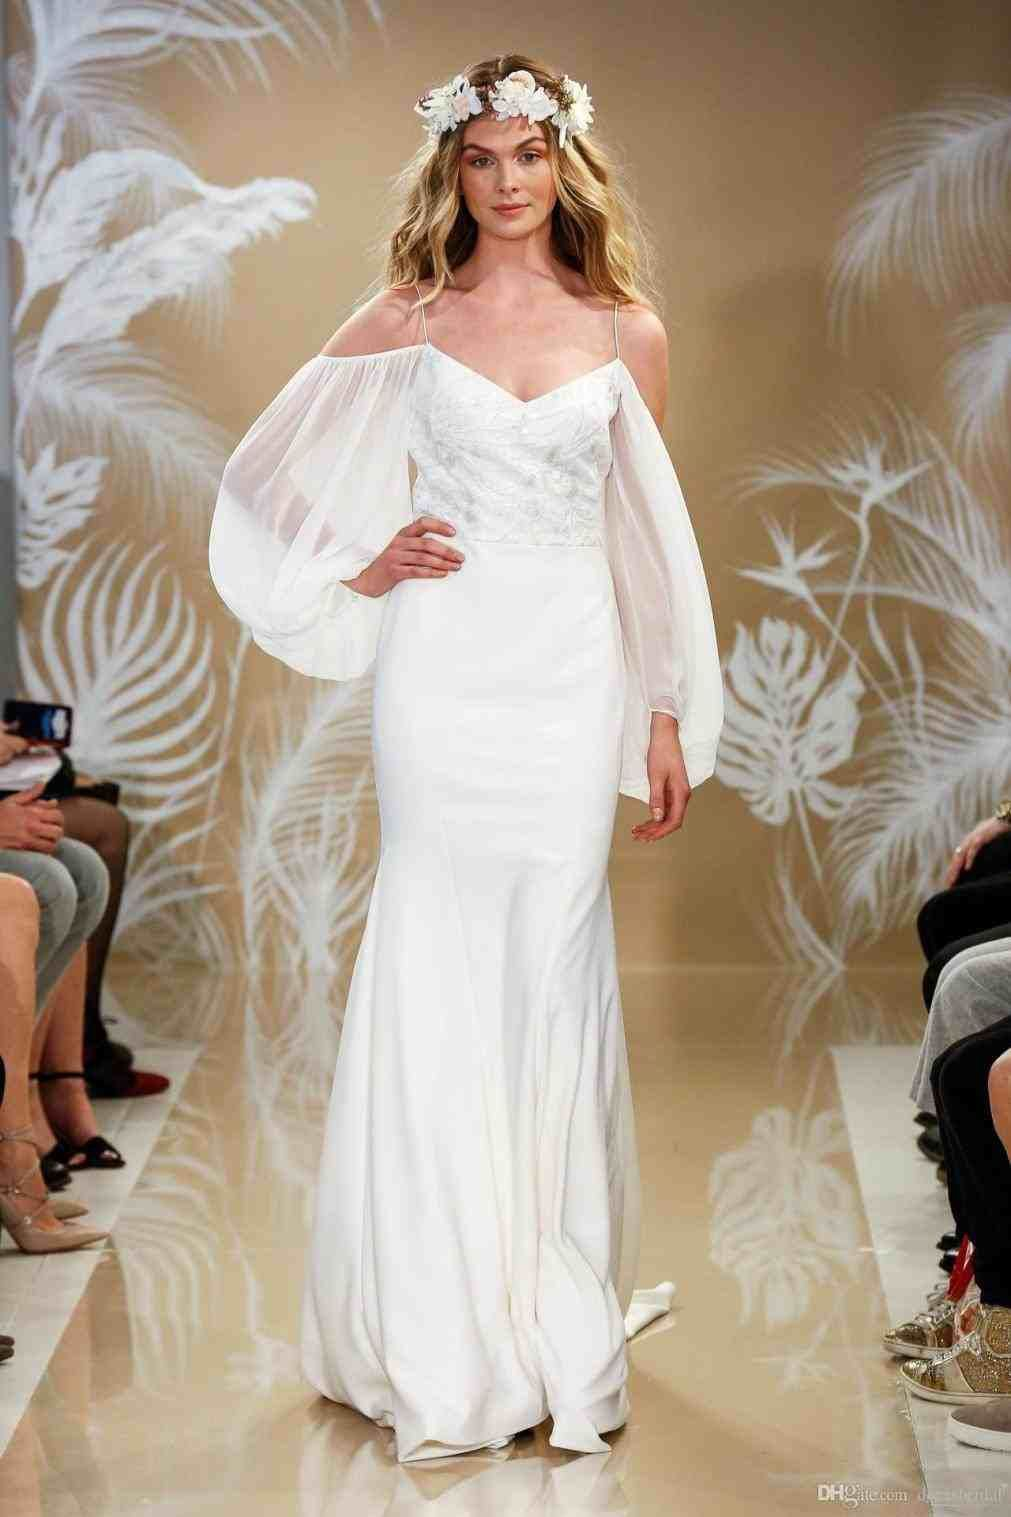 Best beach wedding dresses  simple lace beach wedding dress in   Weddings  Pinterest